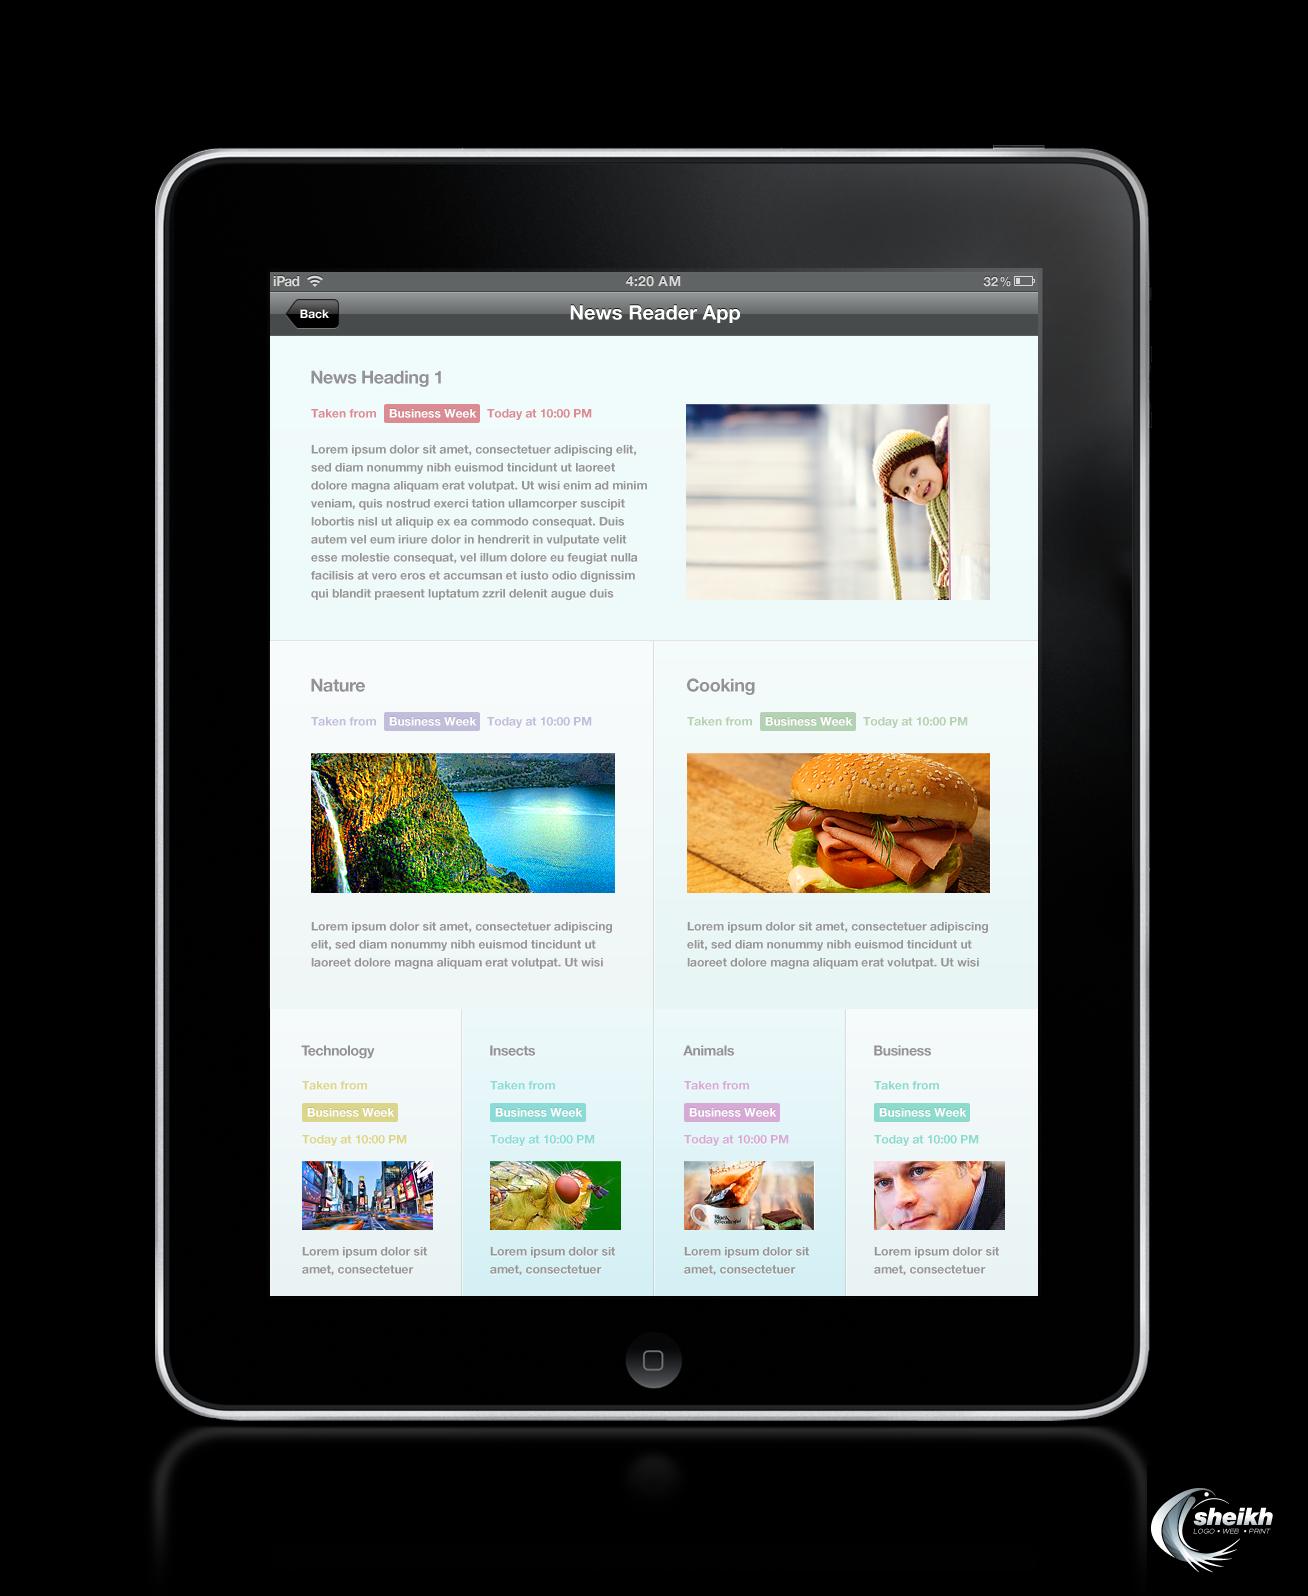 News Reader Ipad App Design by SheikhNaveed on DeviantArt